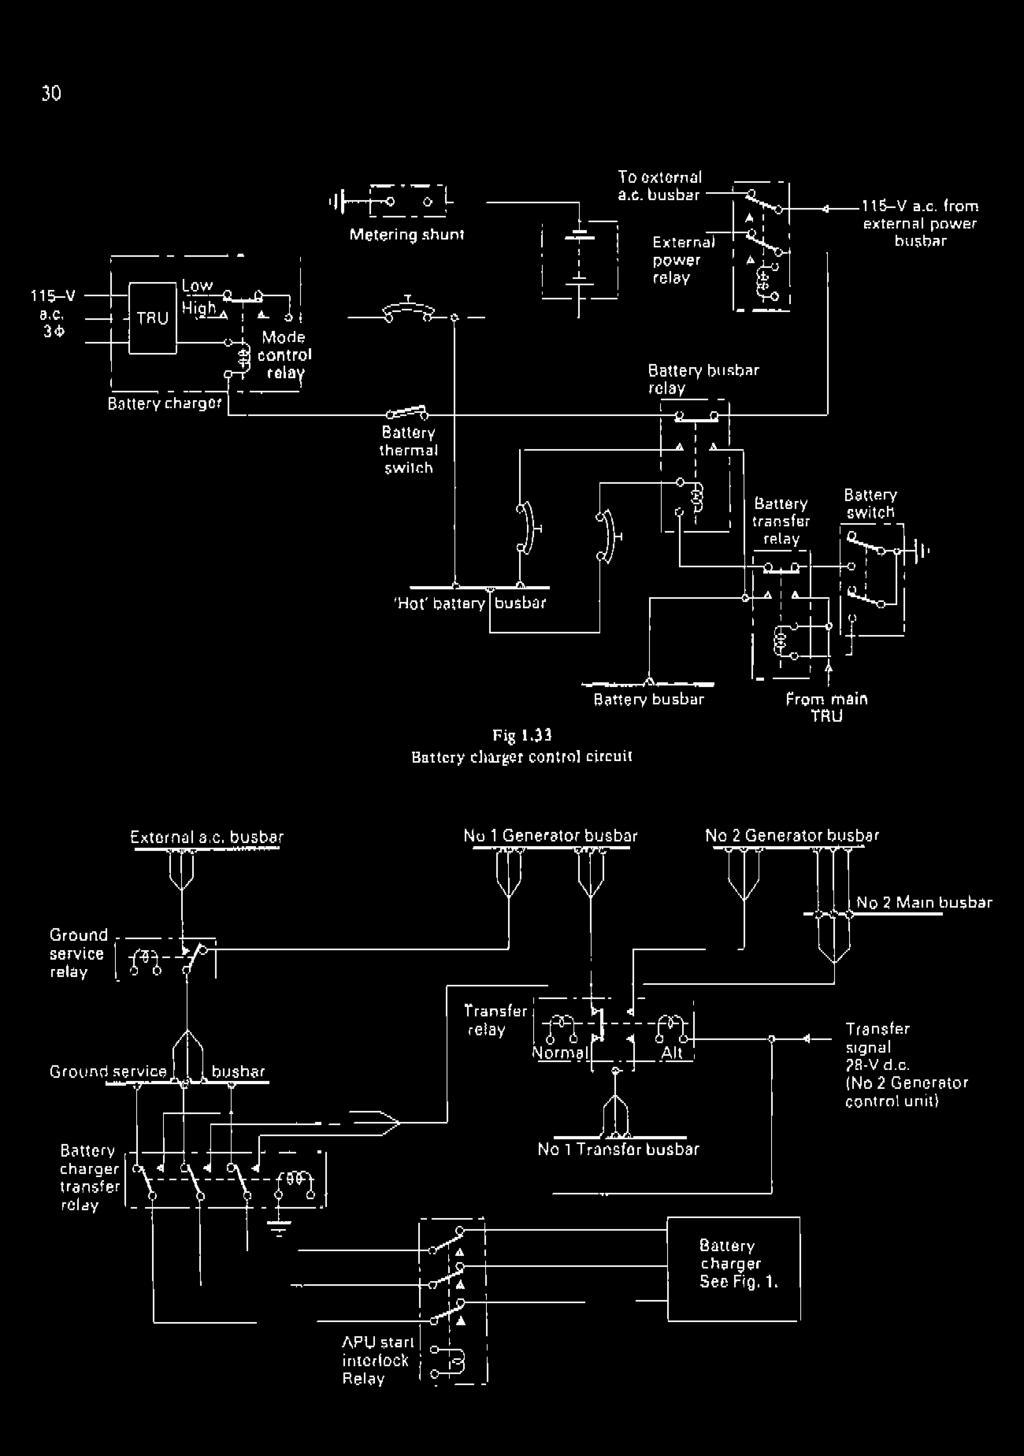 hight resolution of circuit battery busbar from main tru external a c busbar no 1 generator busbar